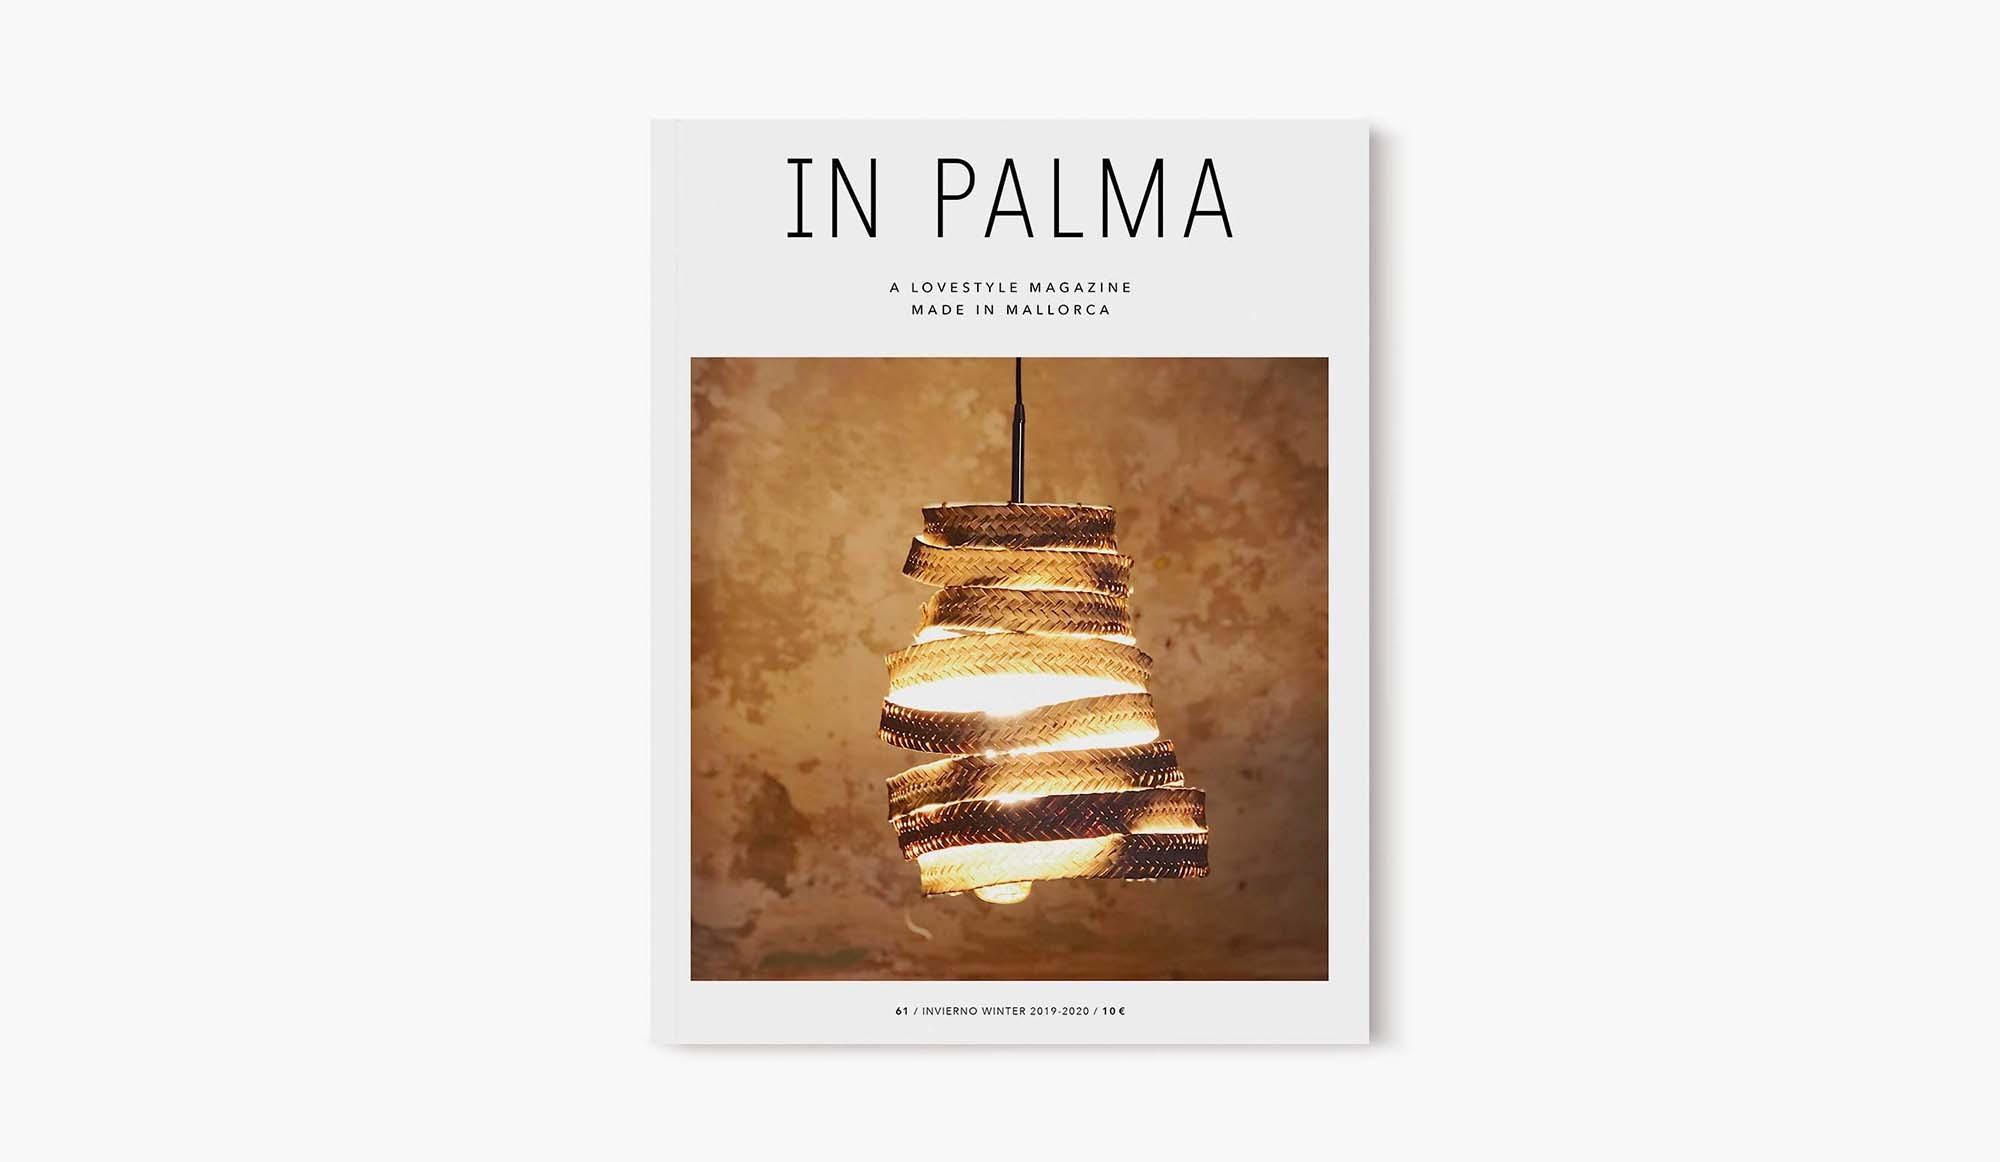 IN PALMA 61